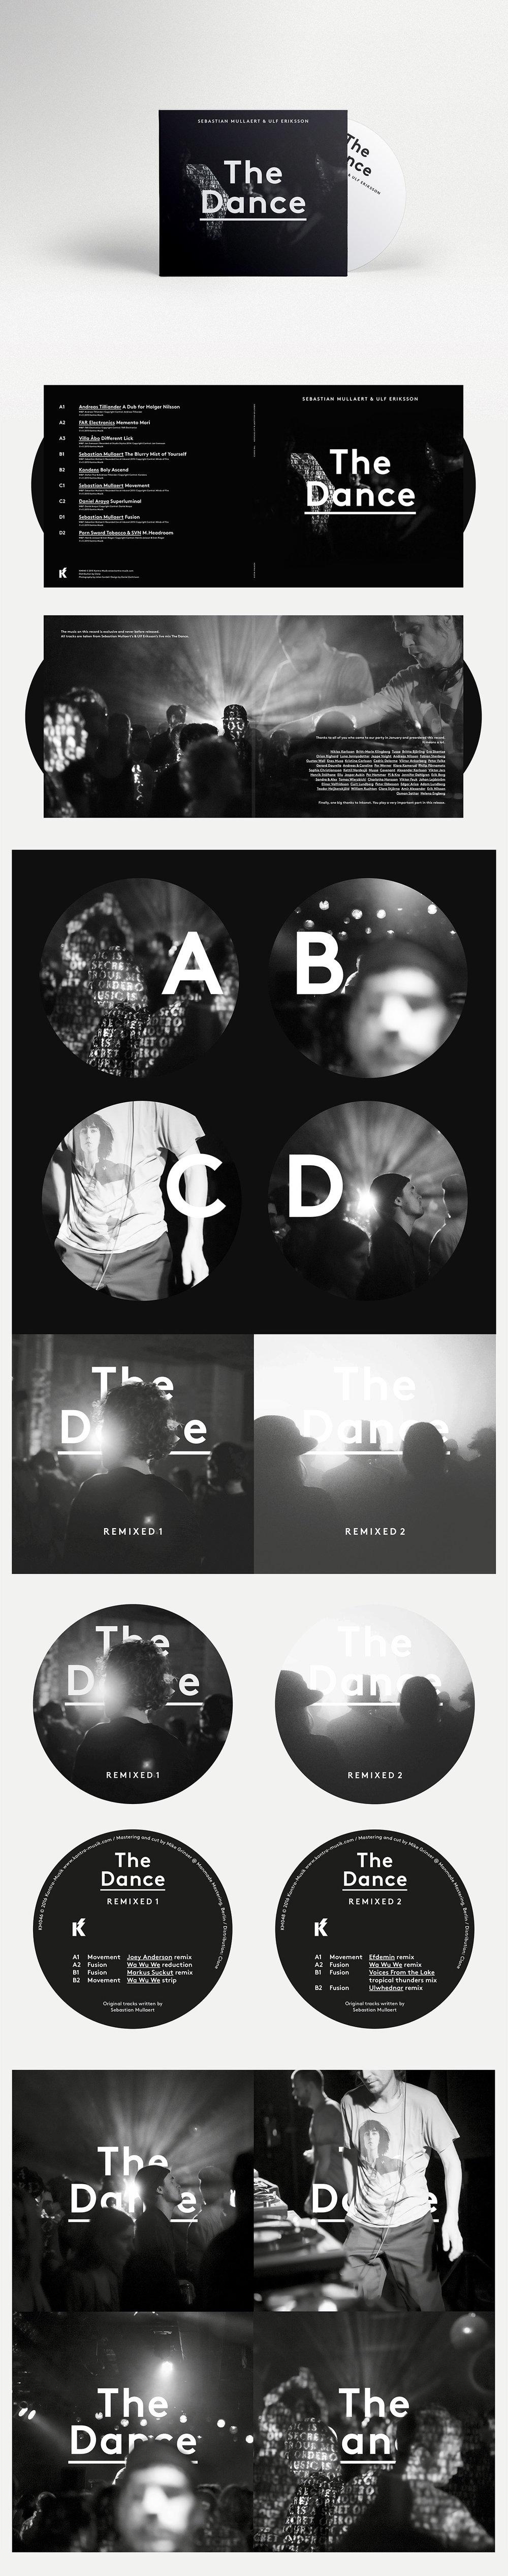 the-dance_kontra-musik.jpg